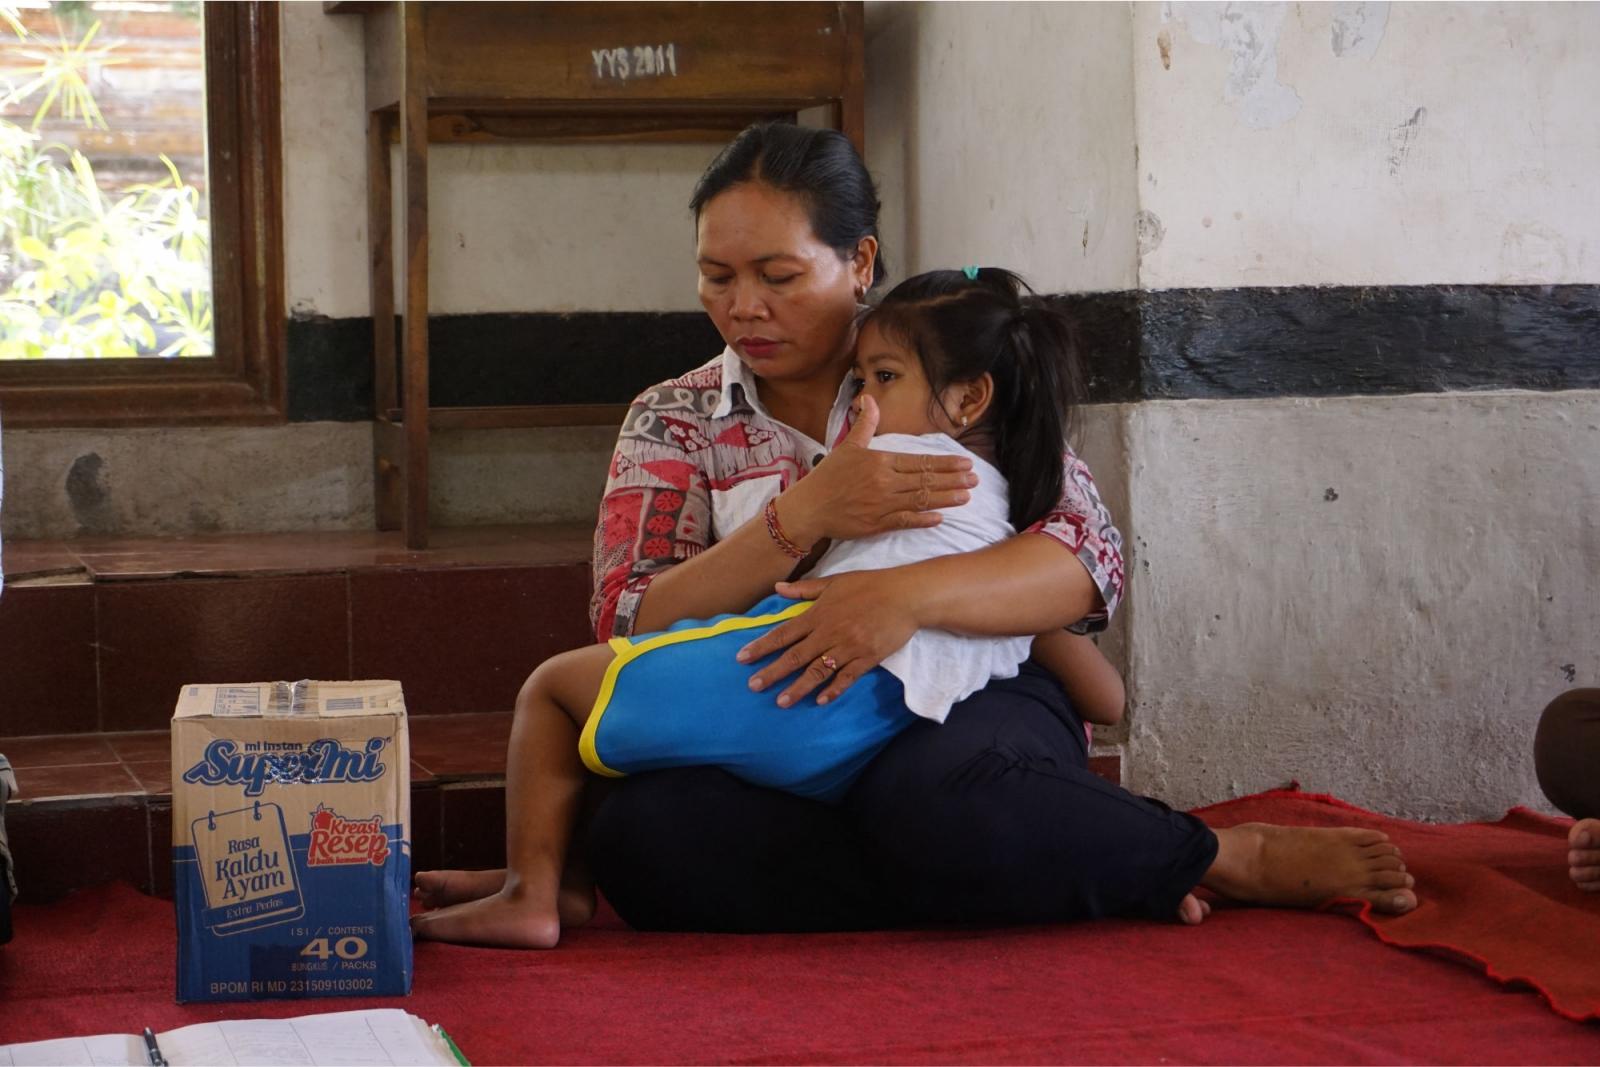 Bali Emporio Architect Team Conducts Charity Activities to Yasa Kerti Karangasem Orphanage Foundatio 6